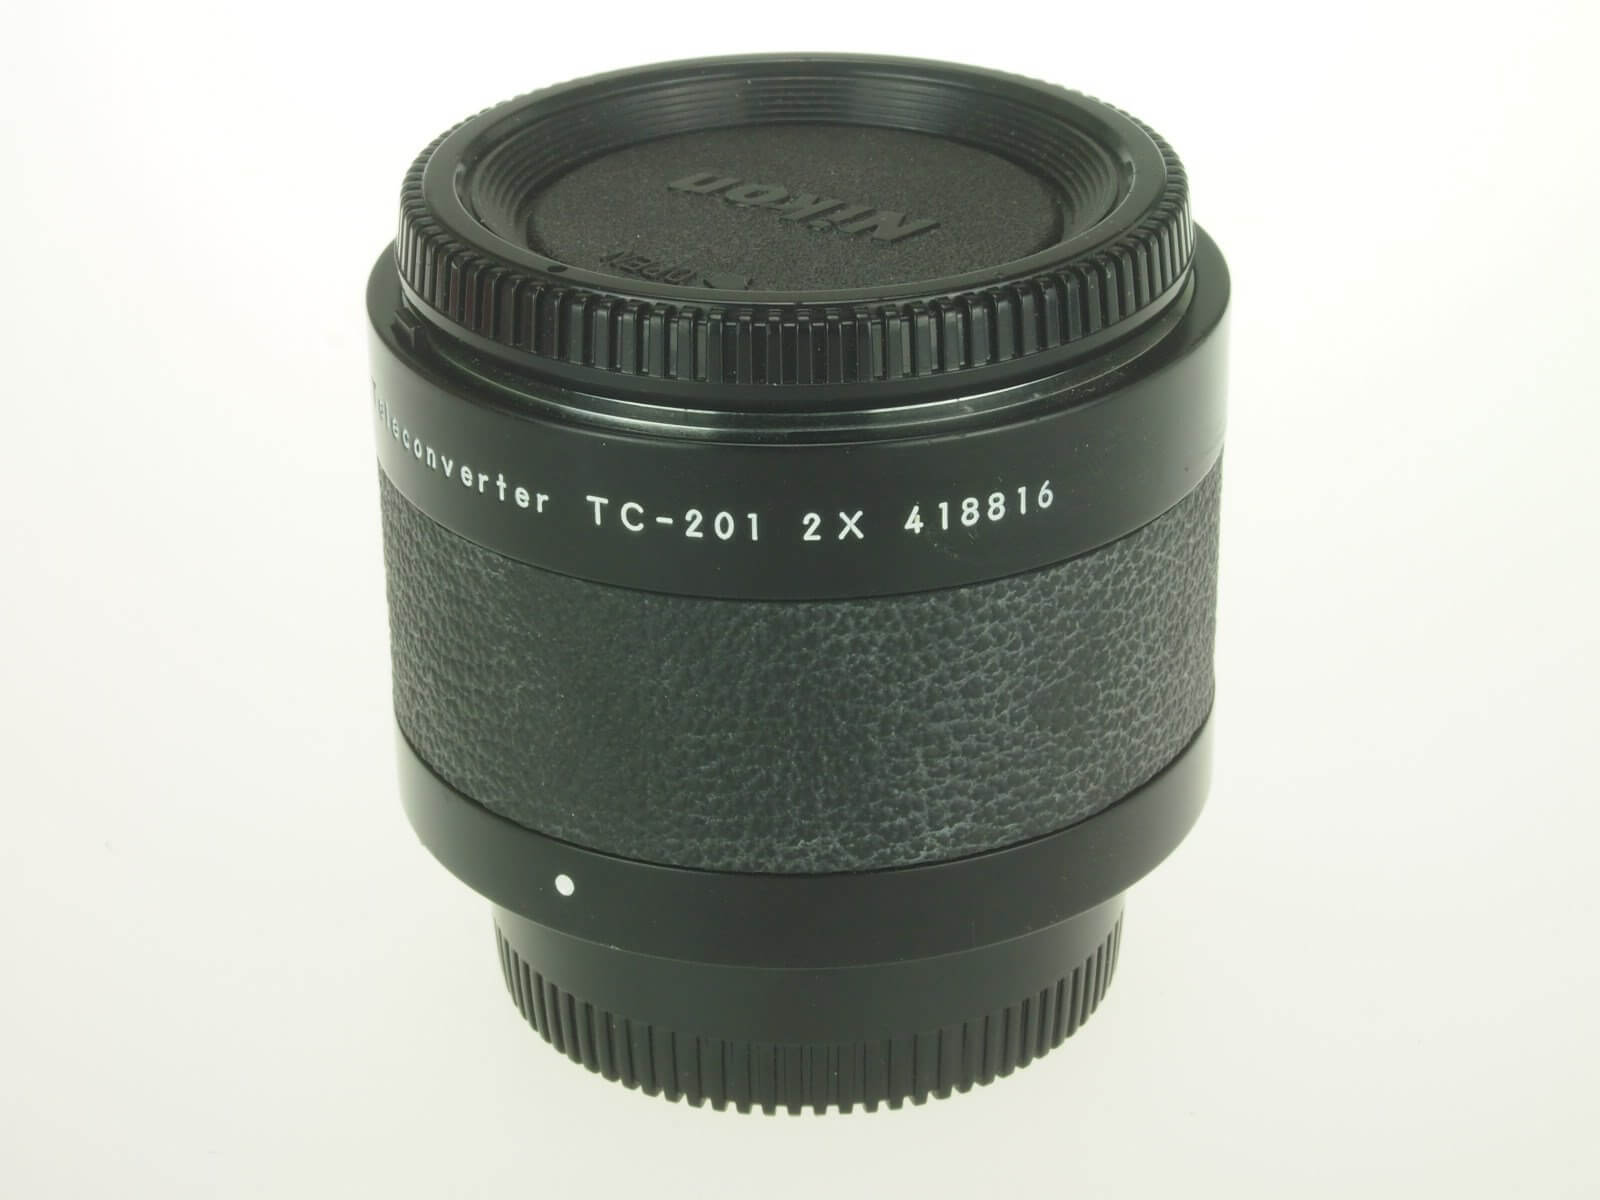 Nikon TC201 teleconverter, virtually mint!